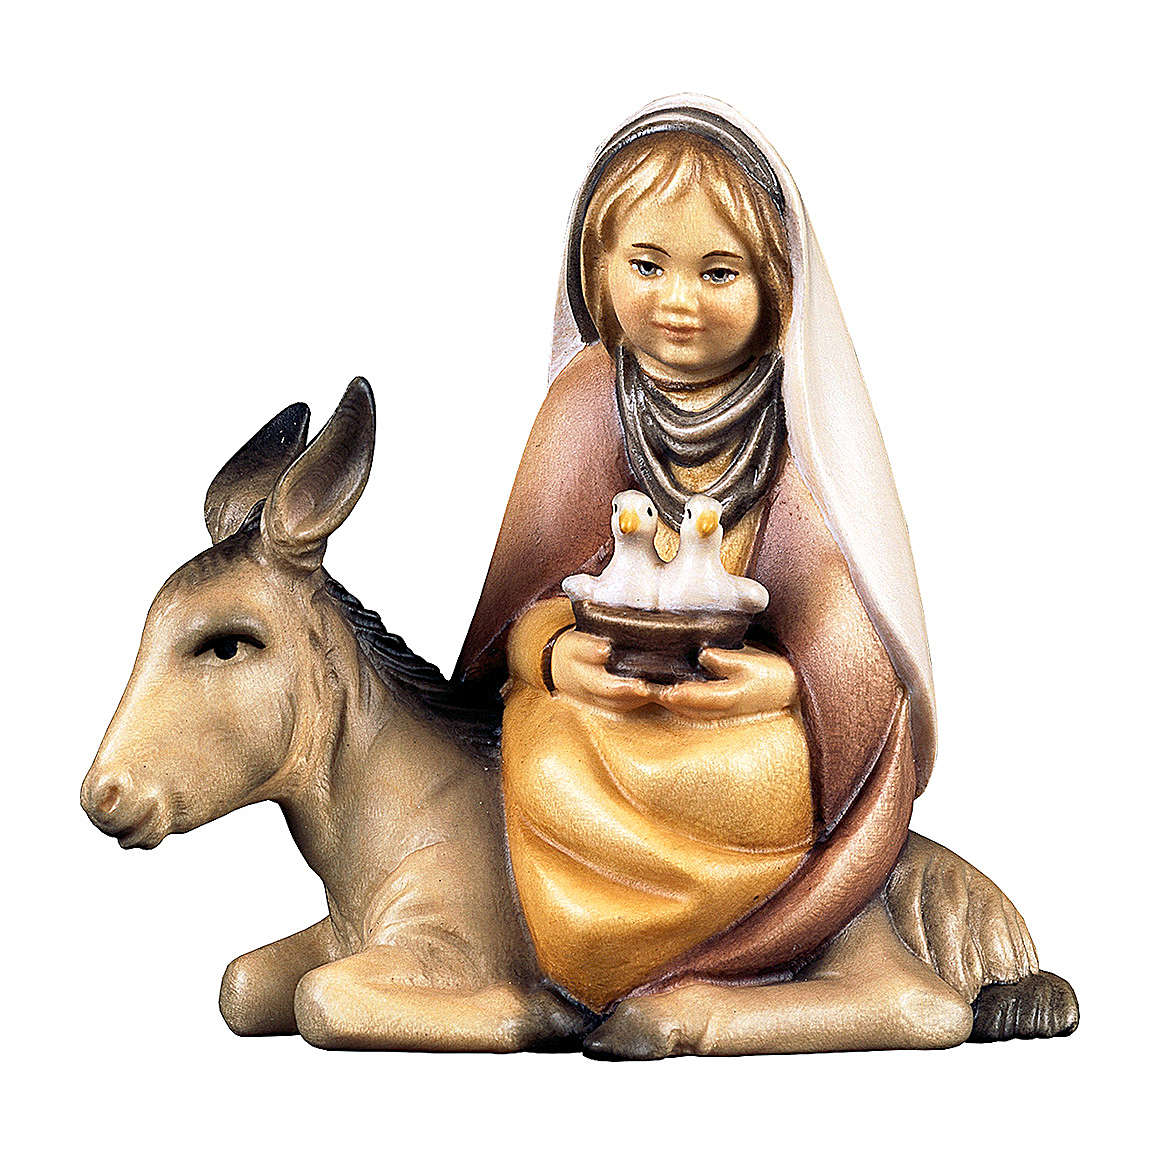 Bambina con colombe su asino presepe Original Cometa legno dipinto in Val Gardena 10 cm 4